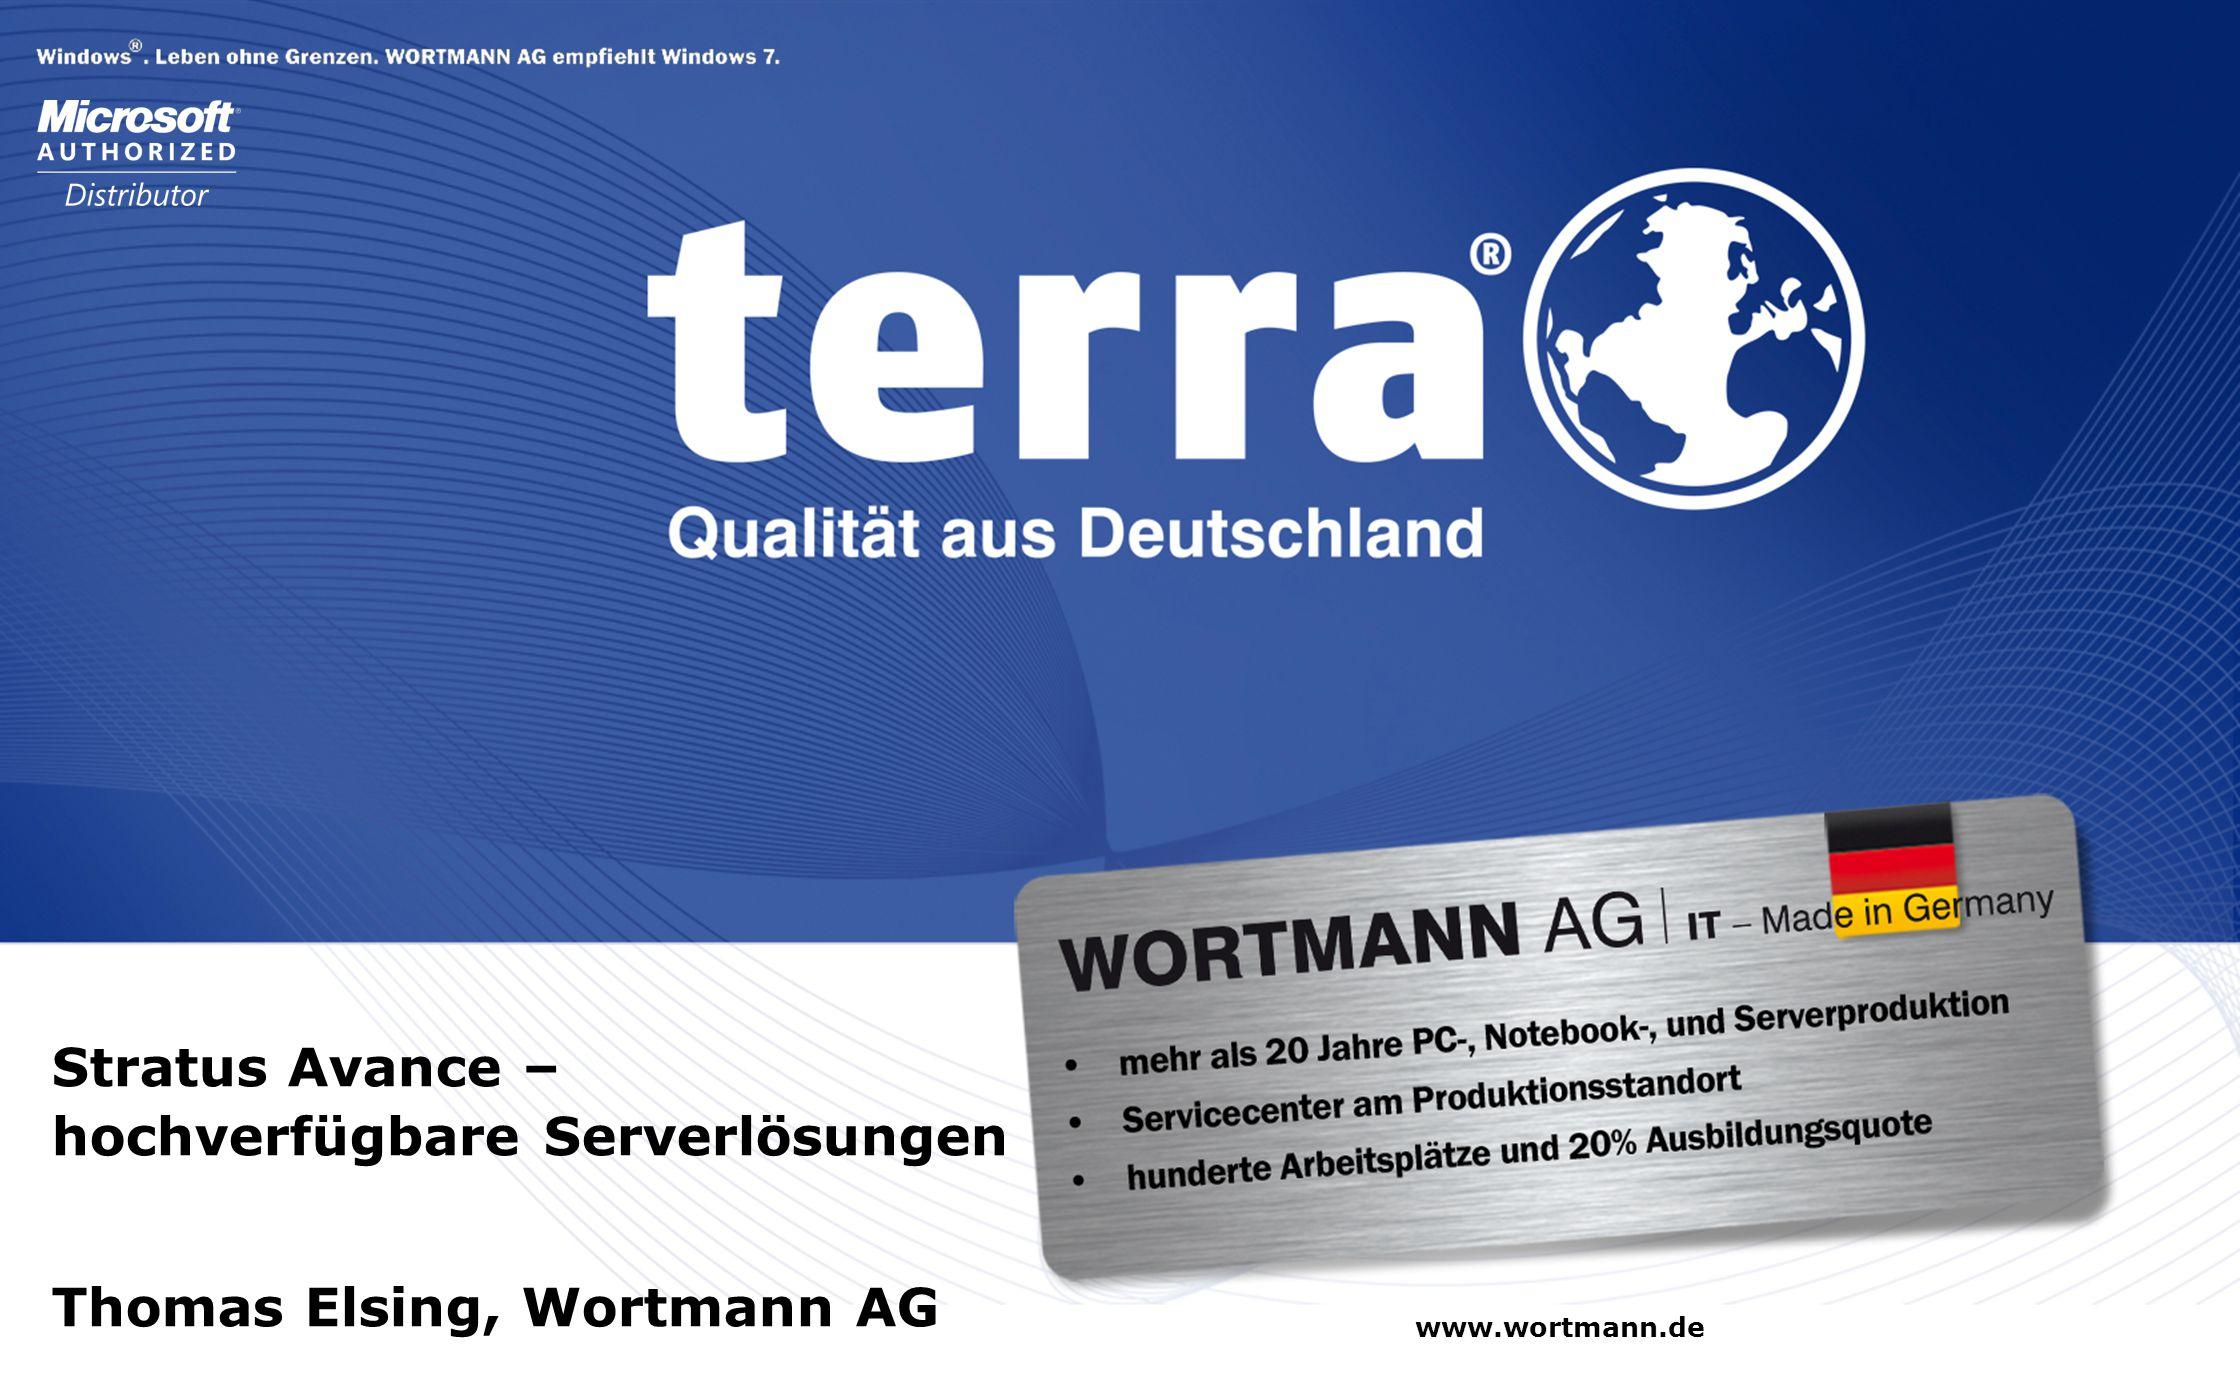 2009 Stratus Avance – hochverfügbare Serverlösungen Thomas Elsing, Wortmann AG www.wortmann.de